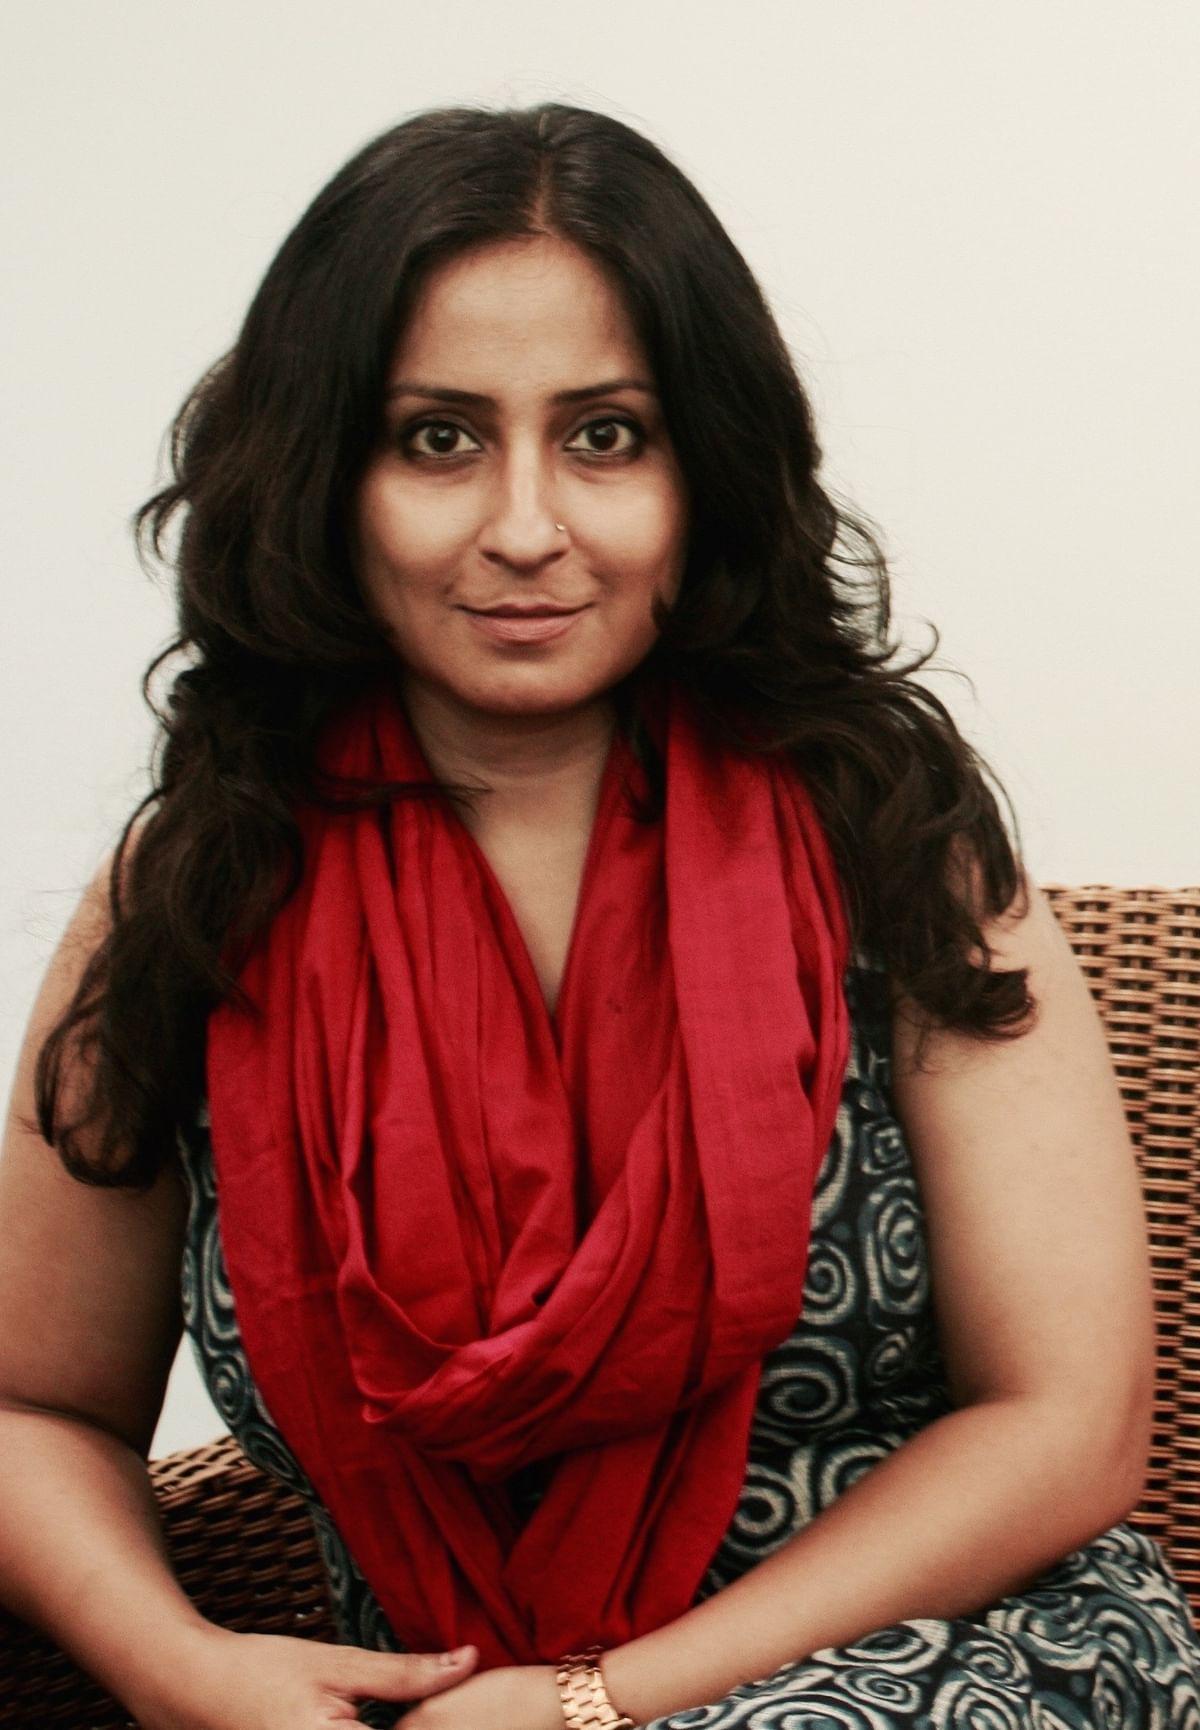 Debarpita Banerjee, Managing Partner - FCB FuelContent India and president - North and East, FCB Ulka